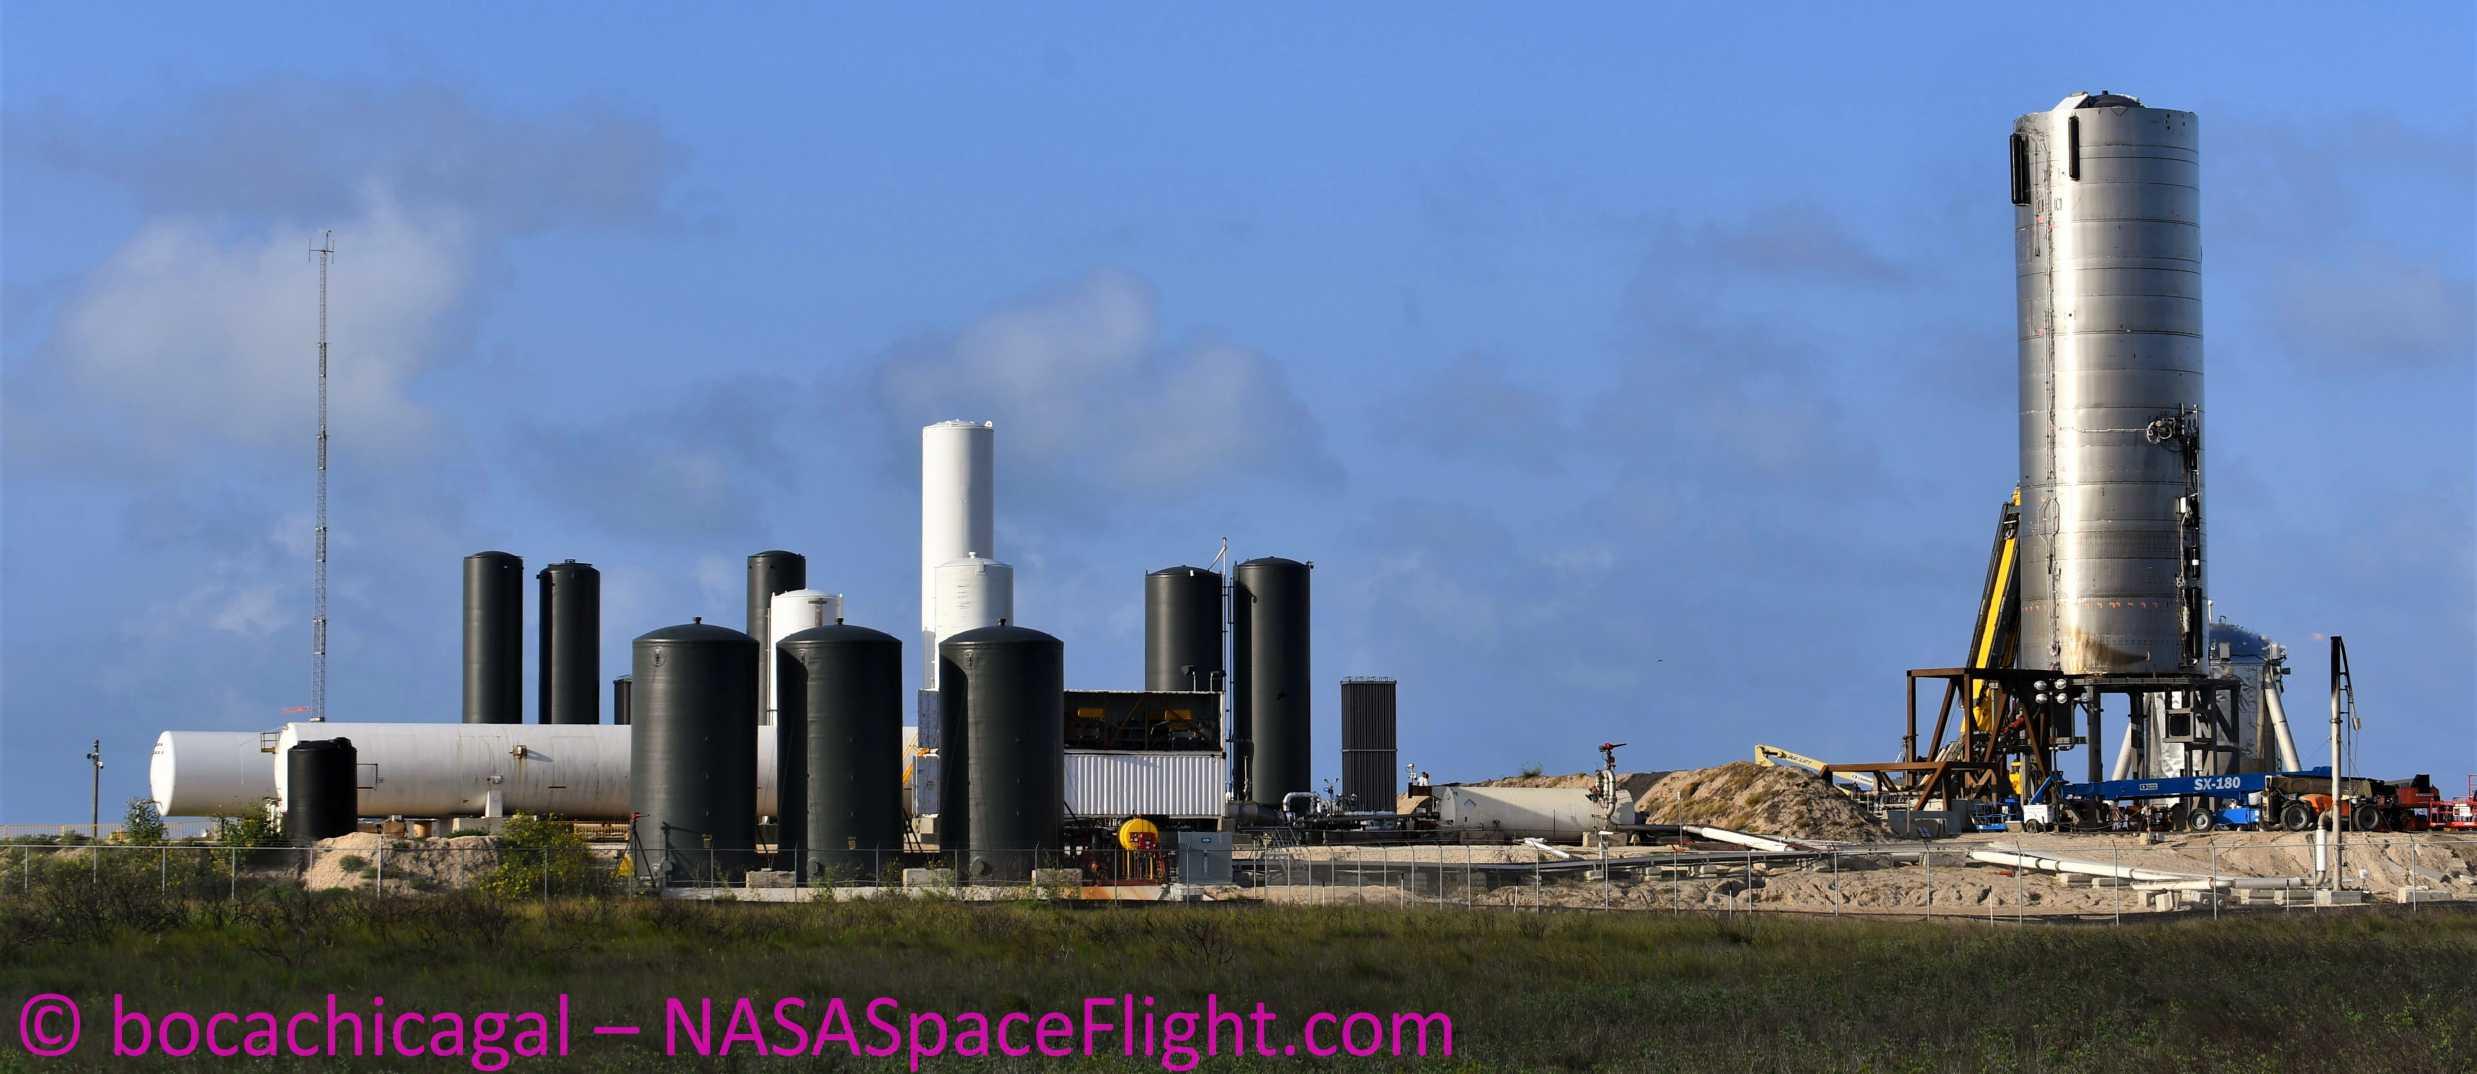 Starship Boca Chica 052320 (NASASpaceflight – bocachicagal) SN4 work 3 crop (c)